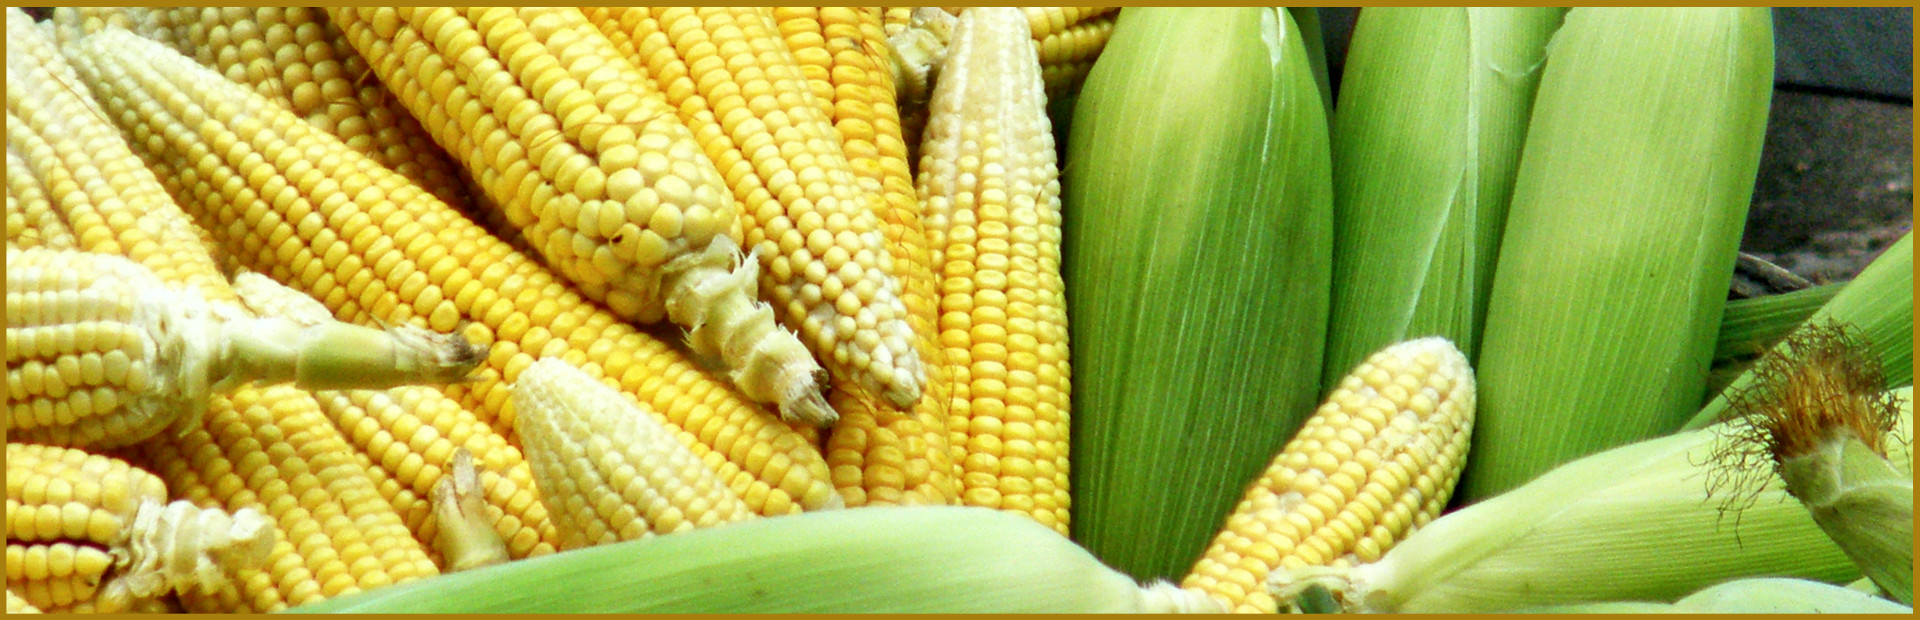 Kühnert Maisquellwasser